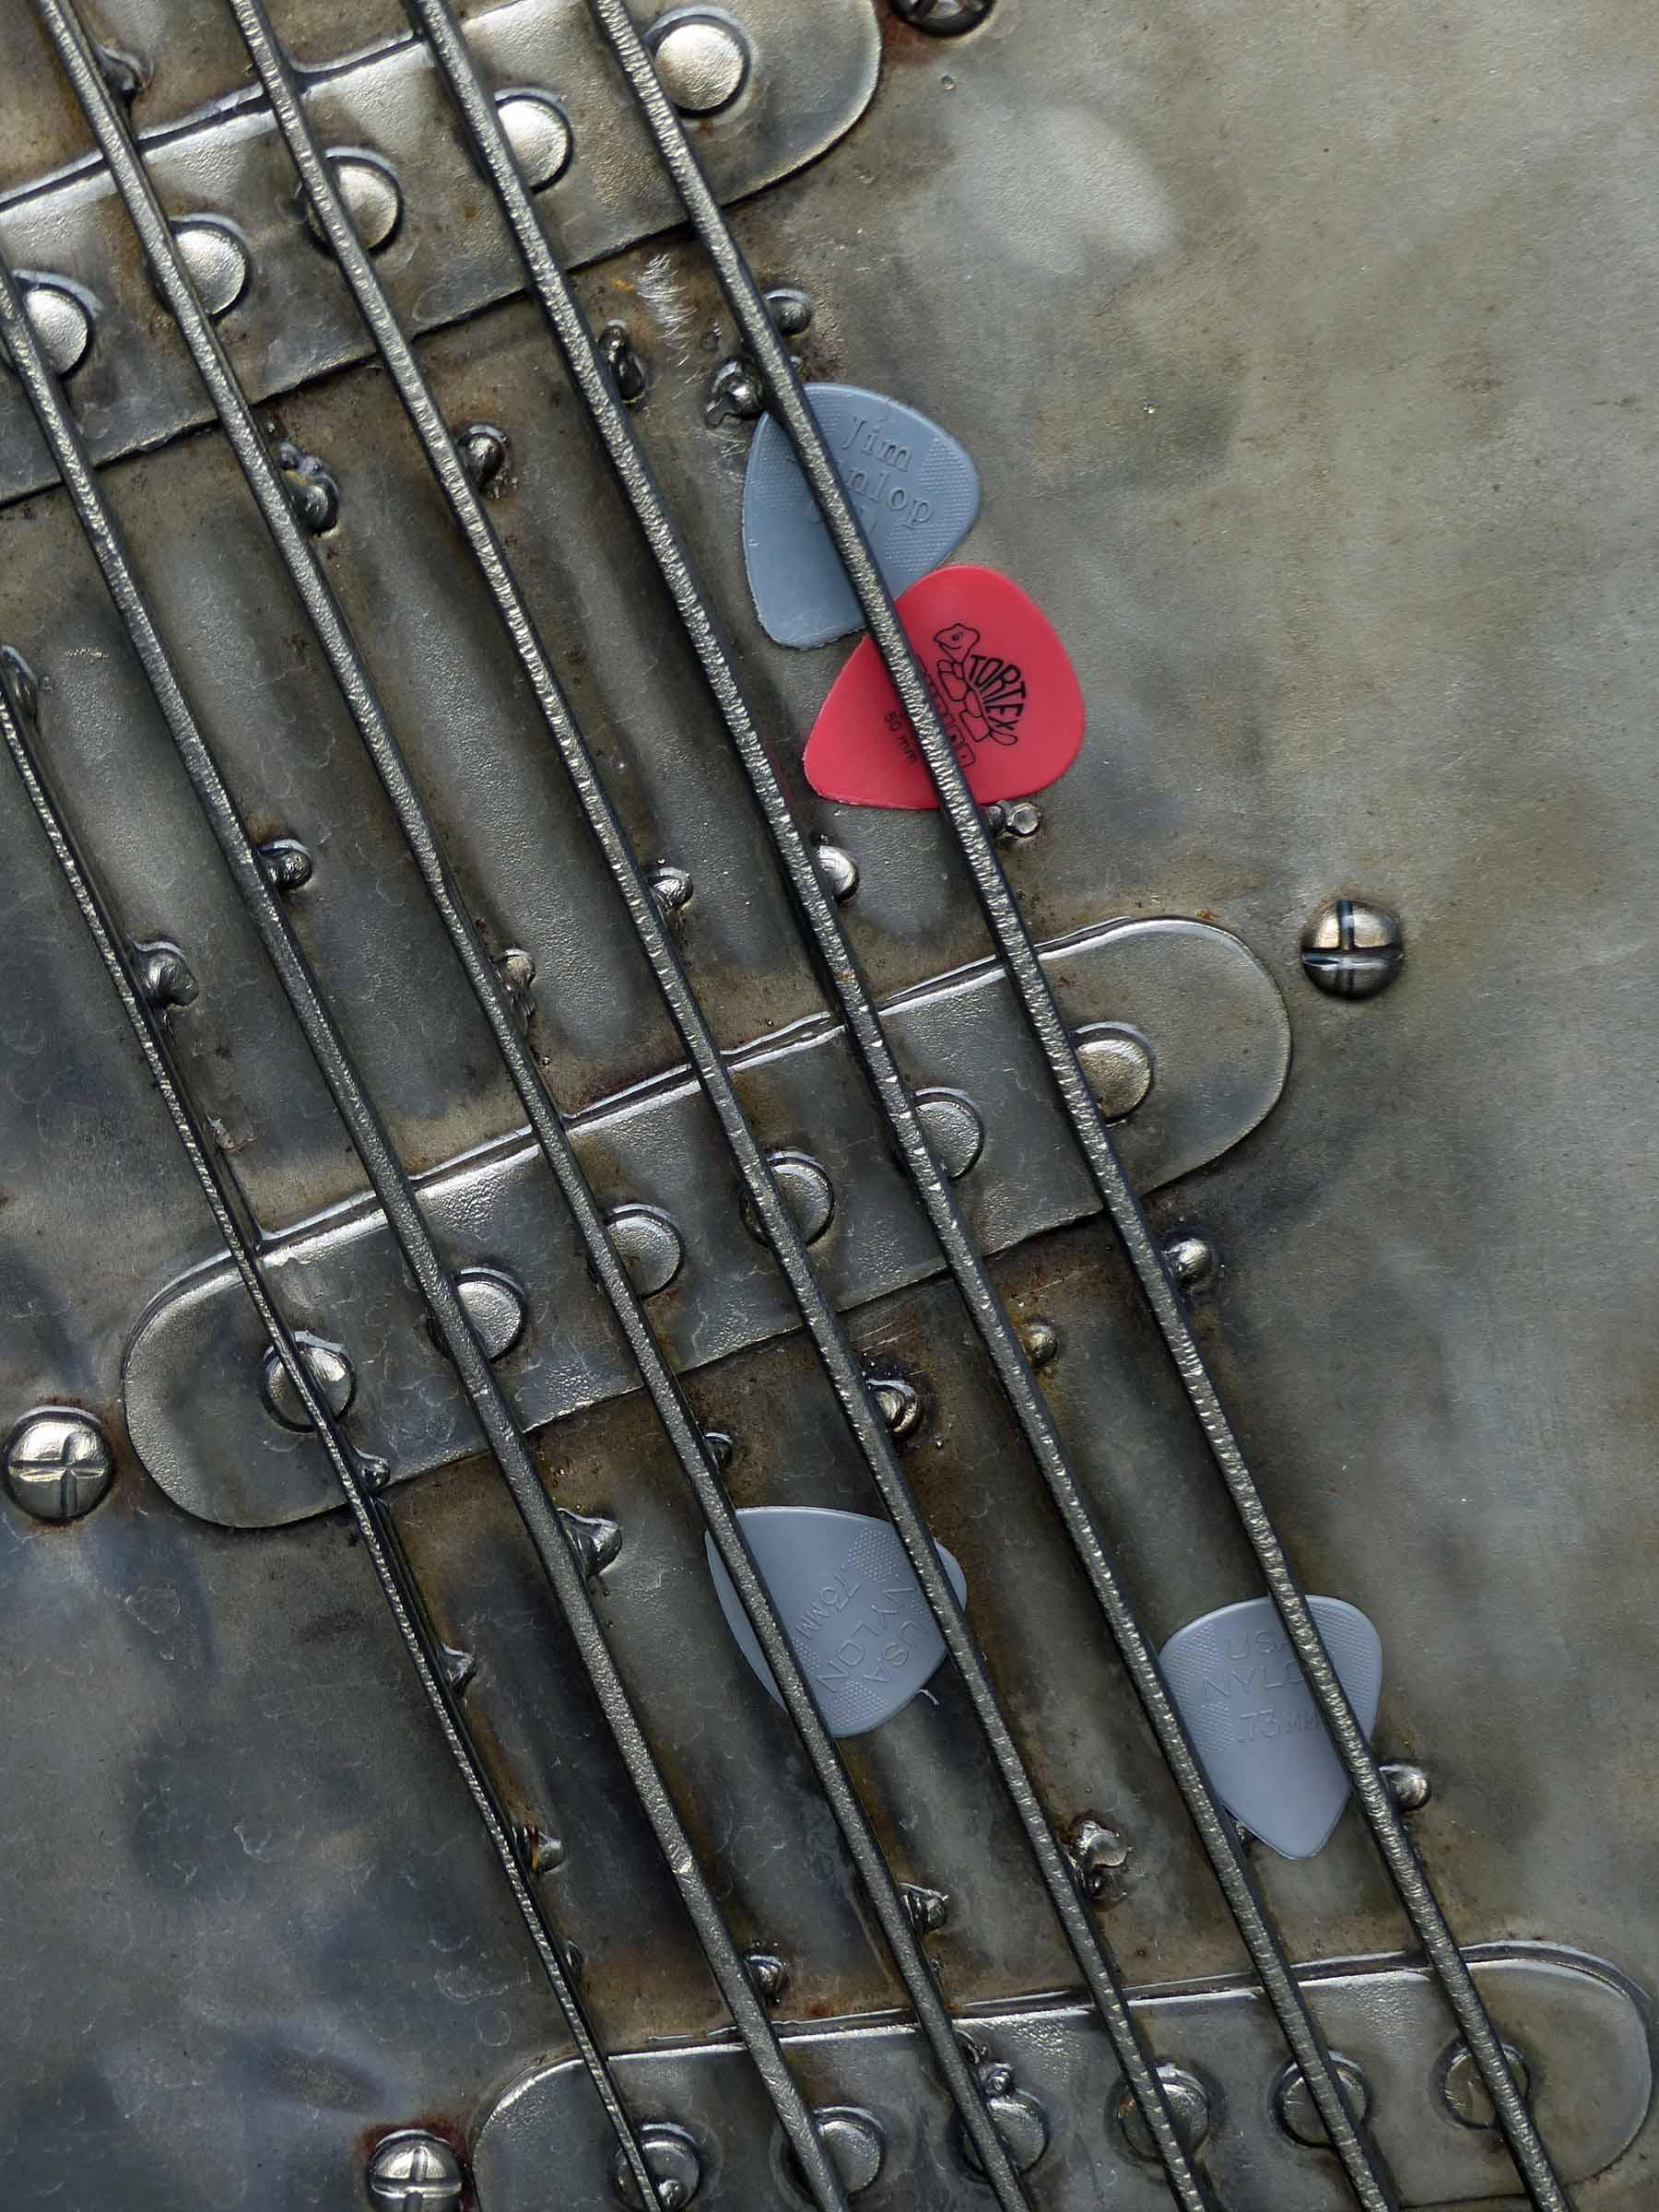 Metal sculpture of guitar strings with plastic plectrums